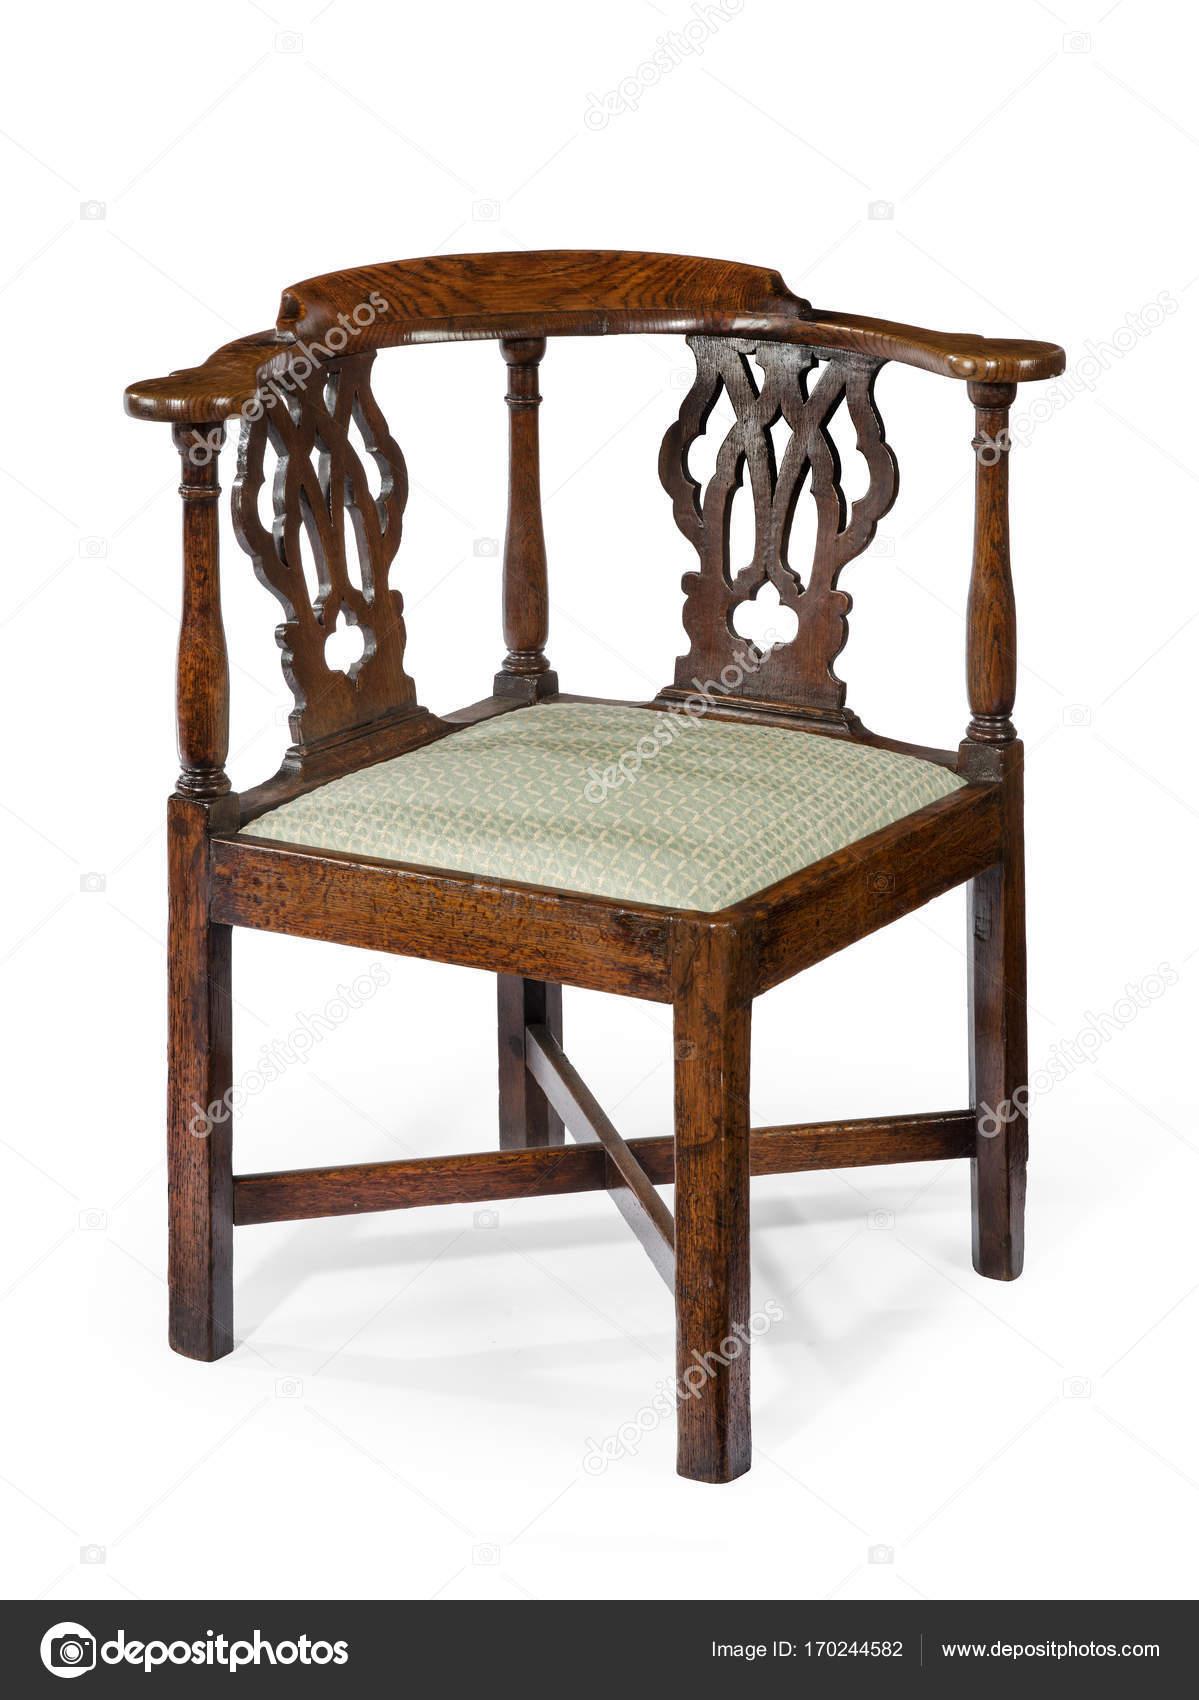 wooden corner chair qdos kneeling posture review antique value furniture